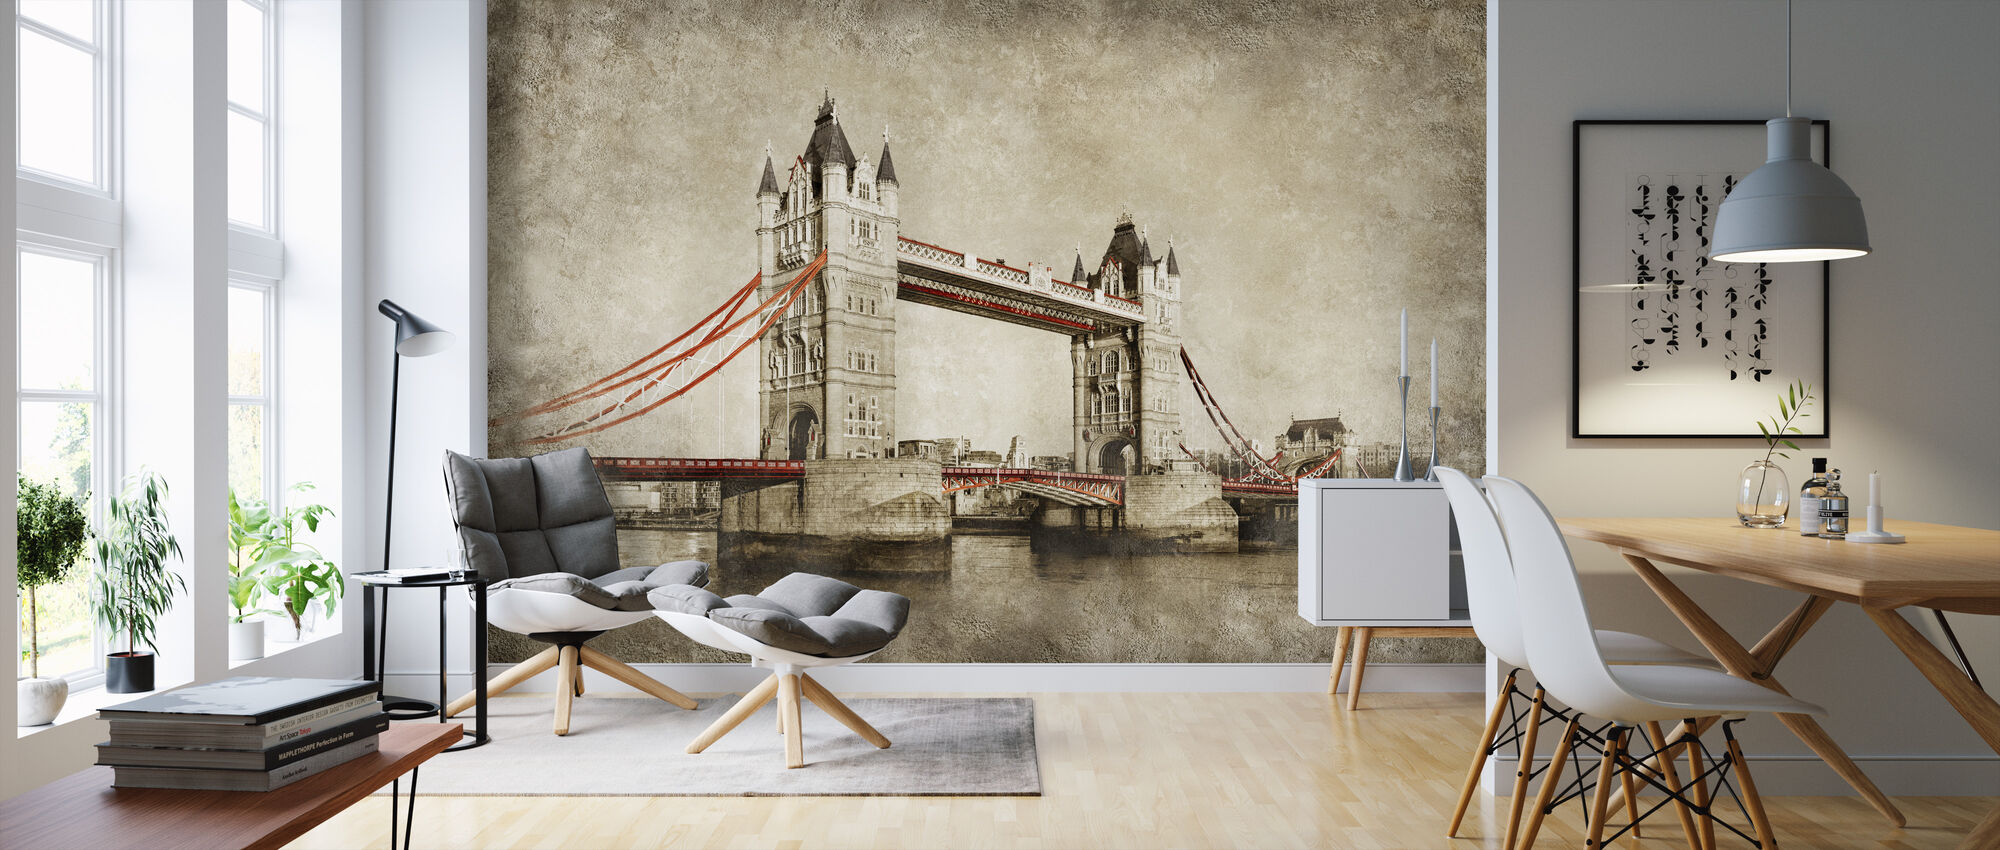 Tower Bridge - London - Wallpaper - Living Room